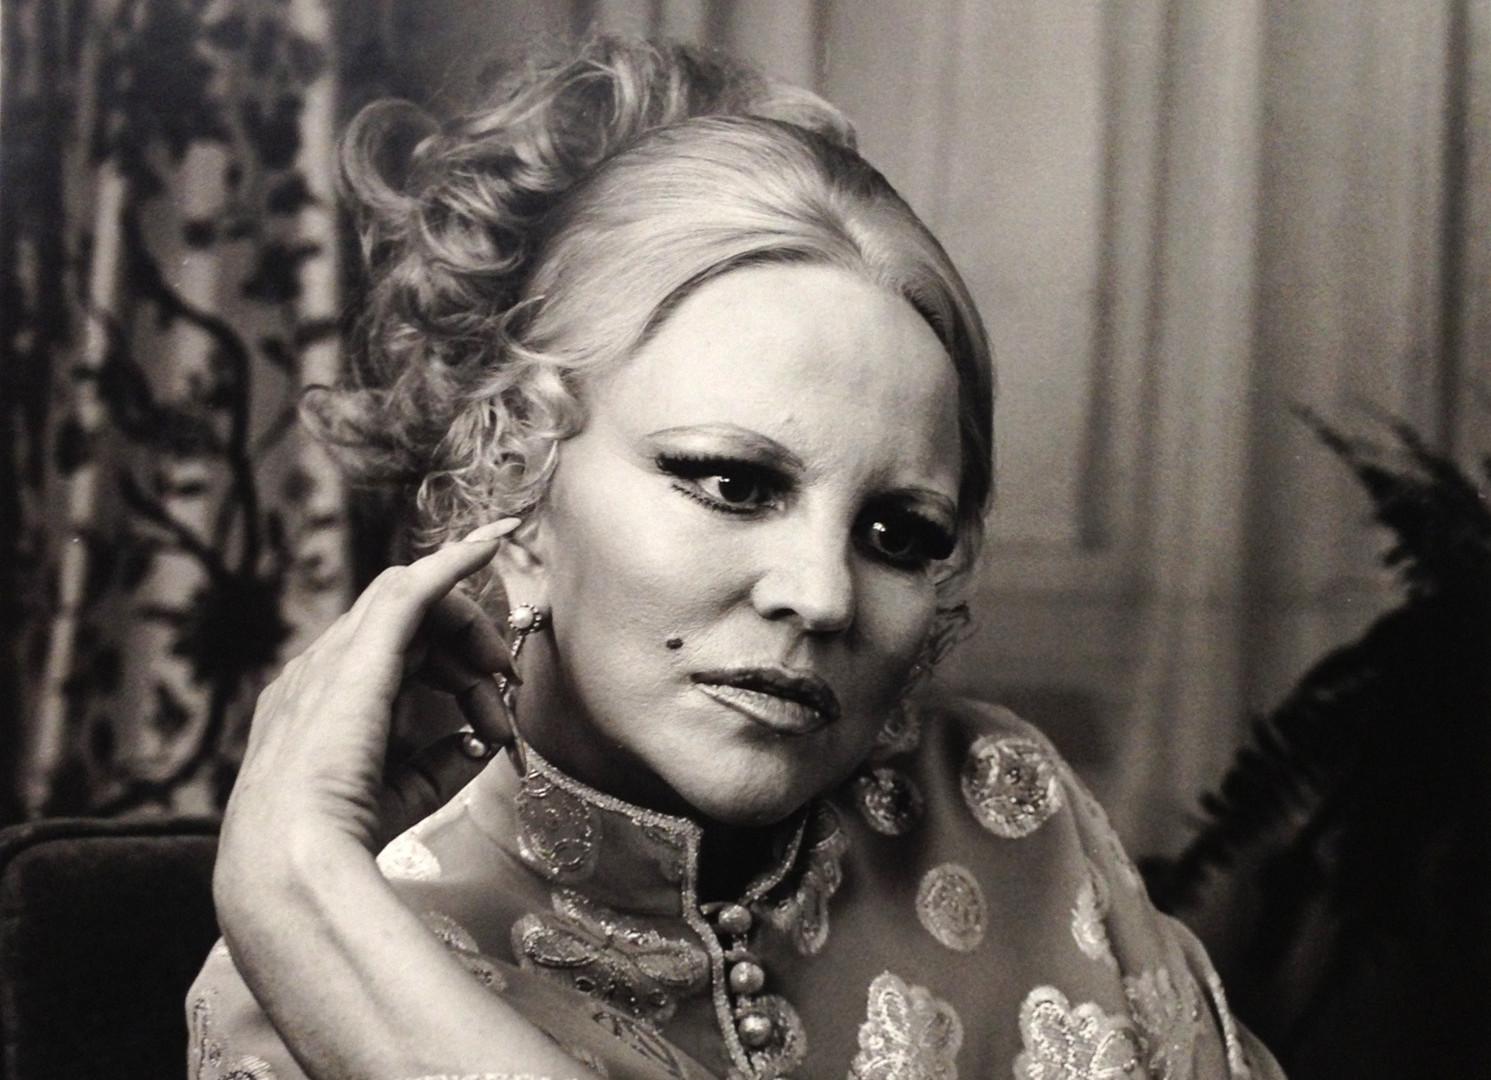 Peter Hujar, Peggy Lee, 1974